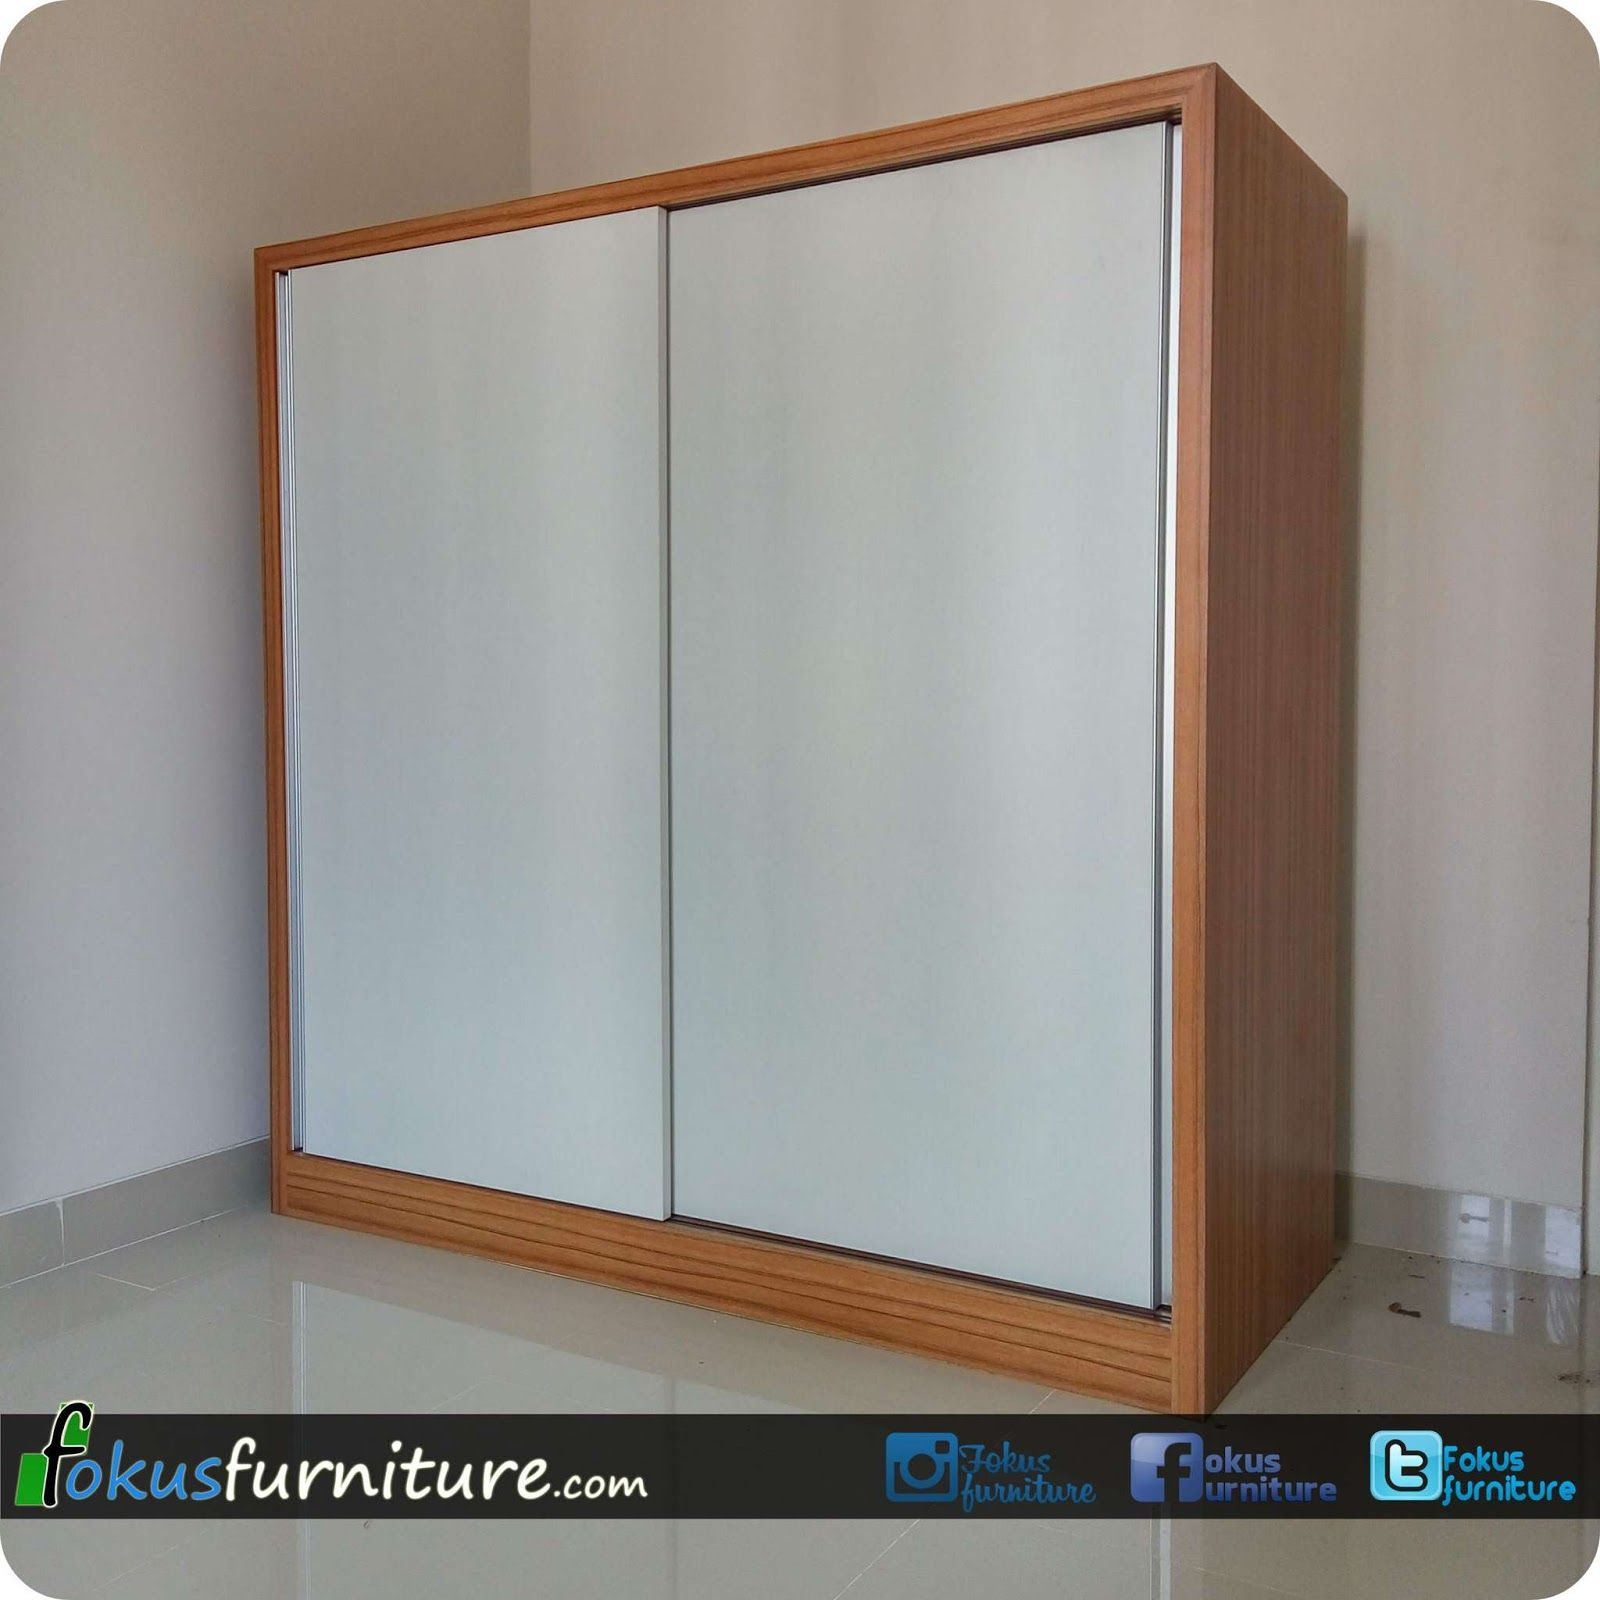 Lemari 2 pintu geser sleding | Fokusfurniture.com kitchen set,lemari ...